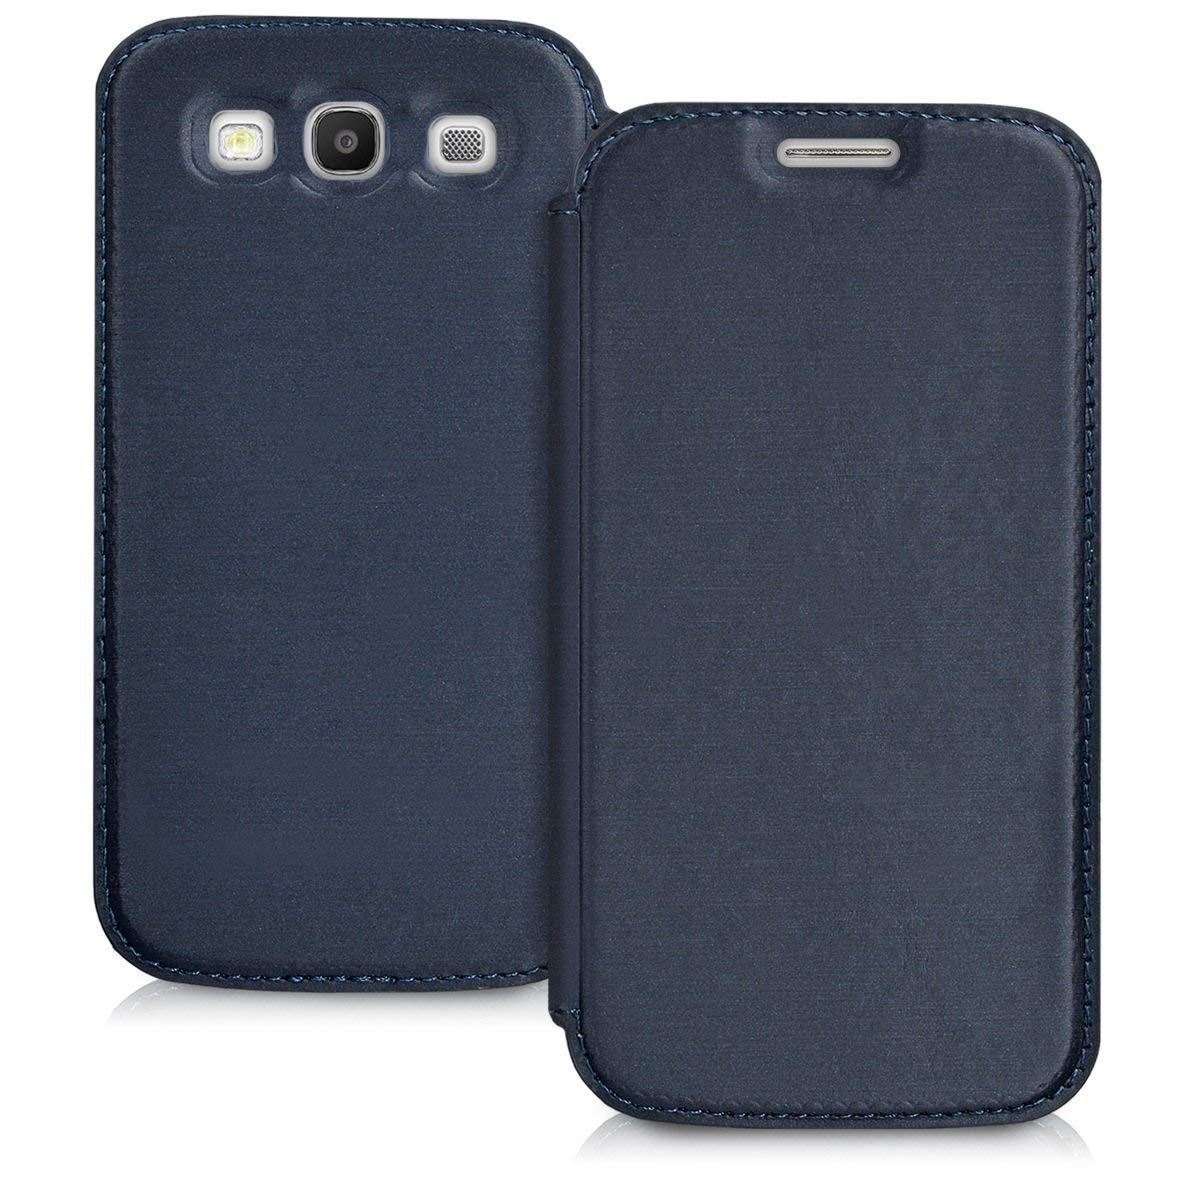 Cheap Samsung Galaxy S3 Flip Case Cover Find Samsung Galaxy S3 Flip Case Cover Deals On Line At Alibaba Com